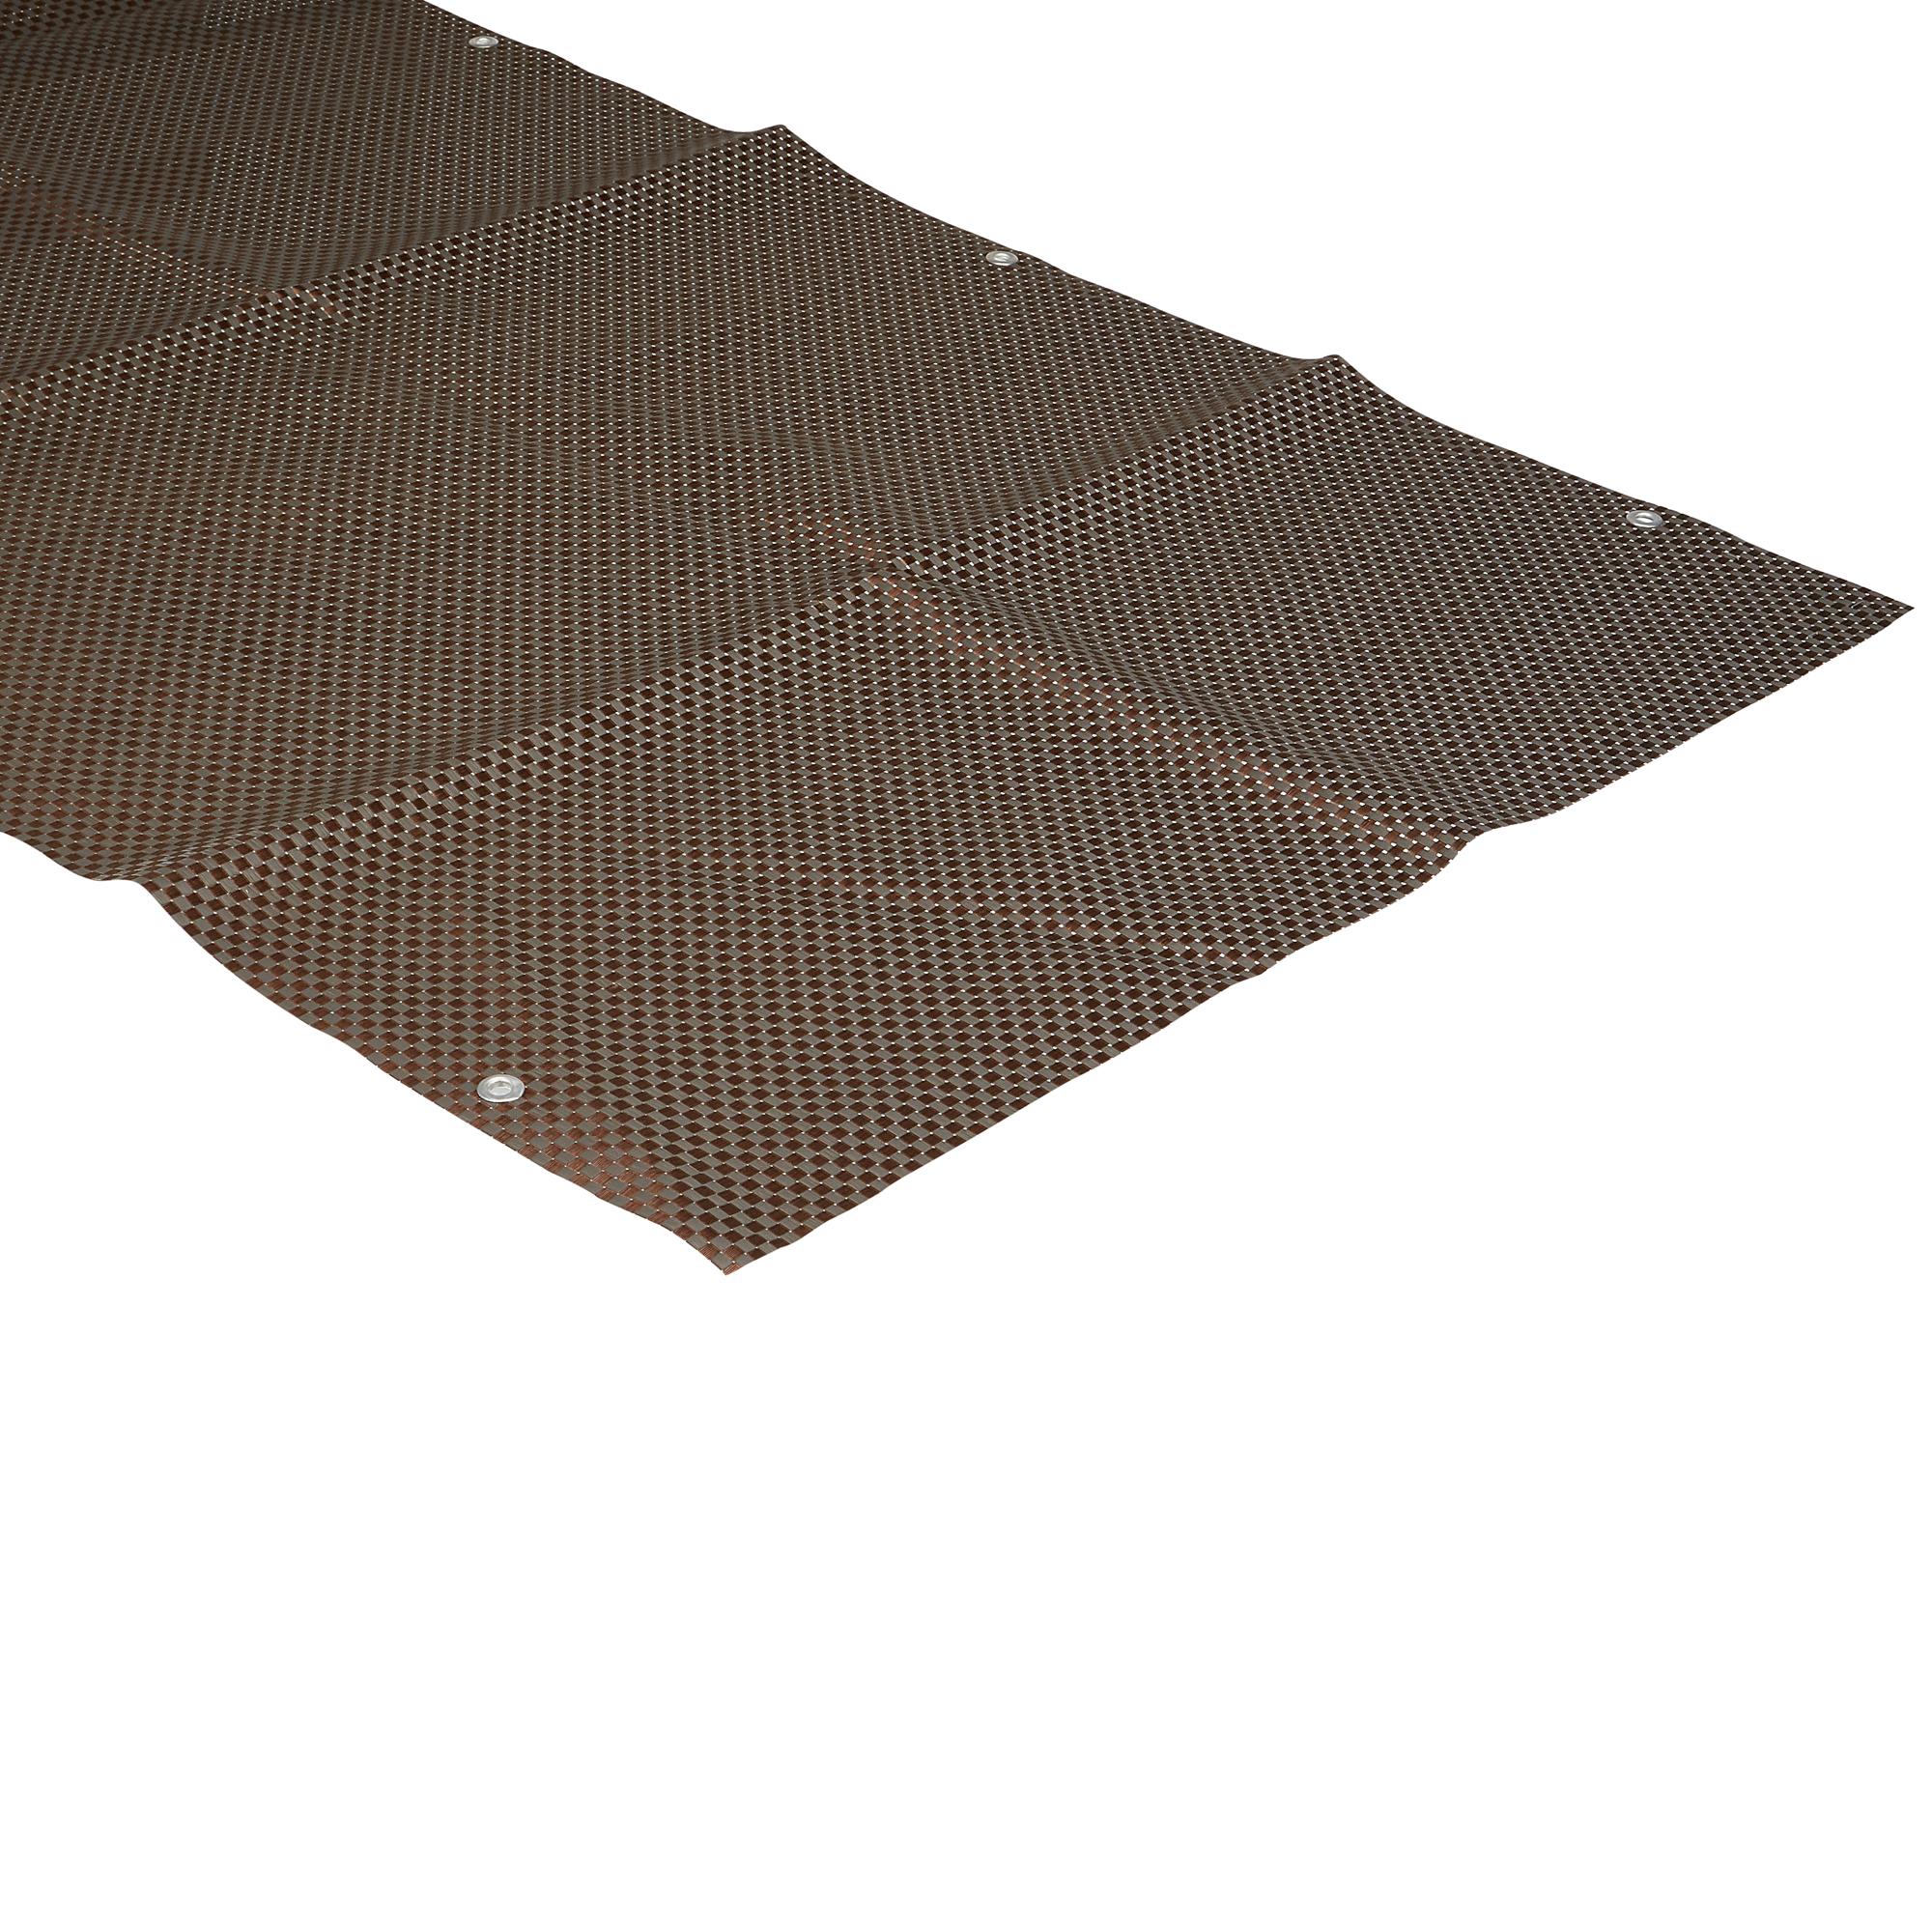 sichtschutz kunststoff rattan optik moccafarben anthrazit 250 x 90 cm toom baumarkt. Black Bedroom Furniture Sets. Home Design Ideas